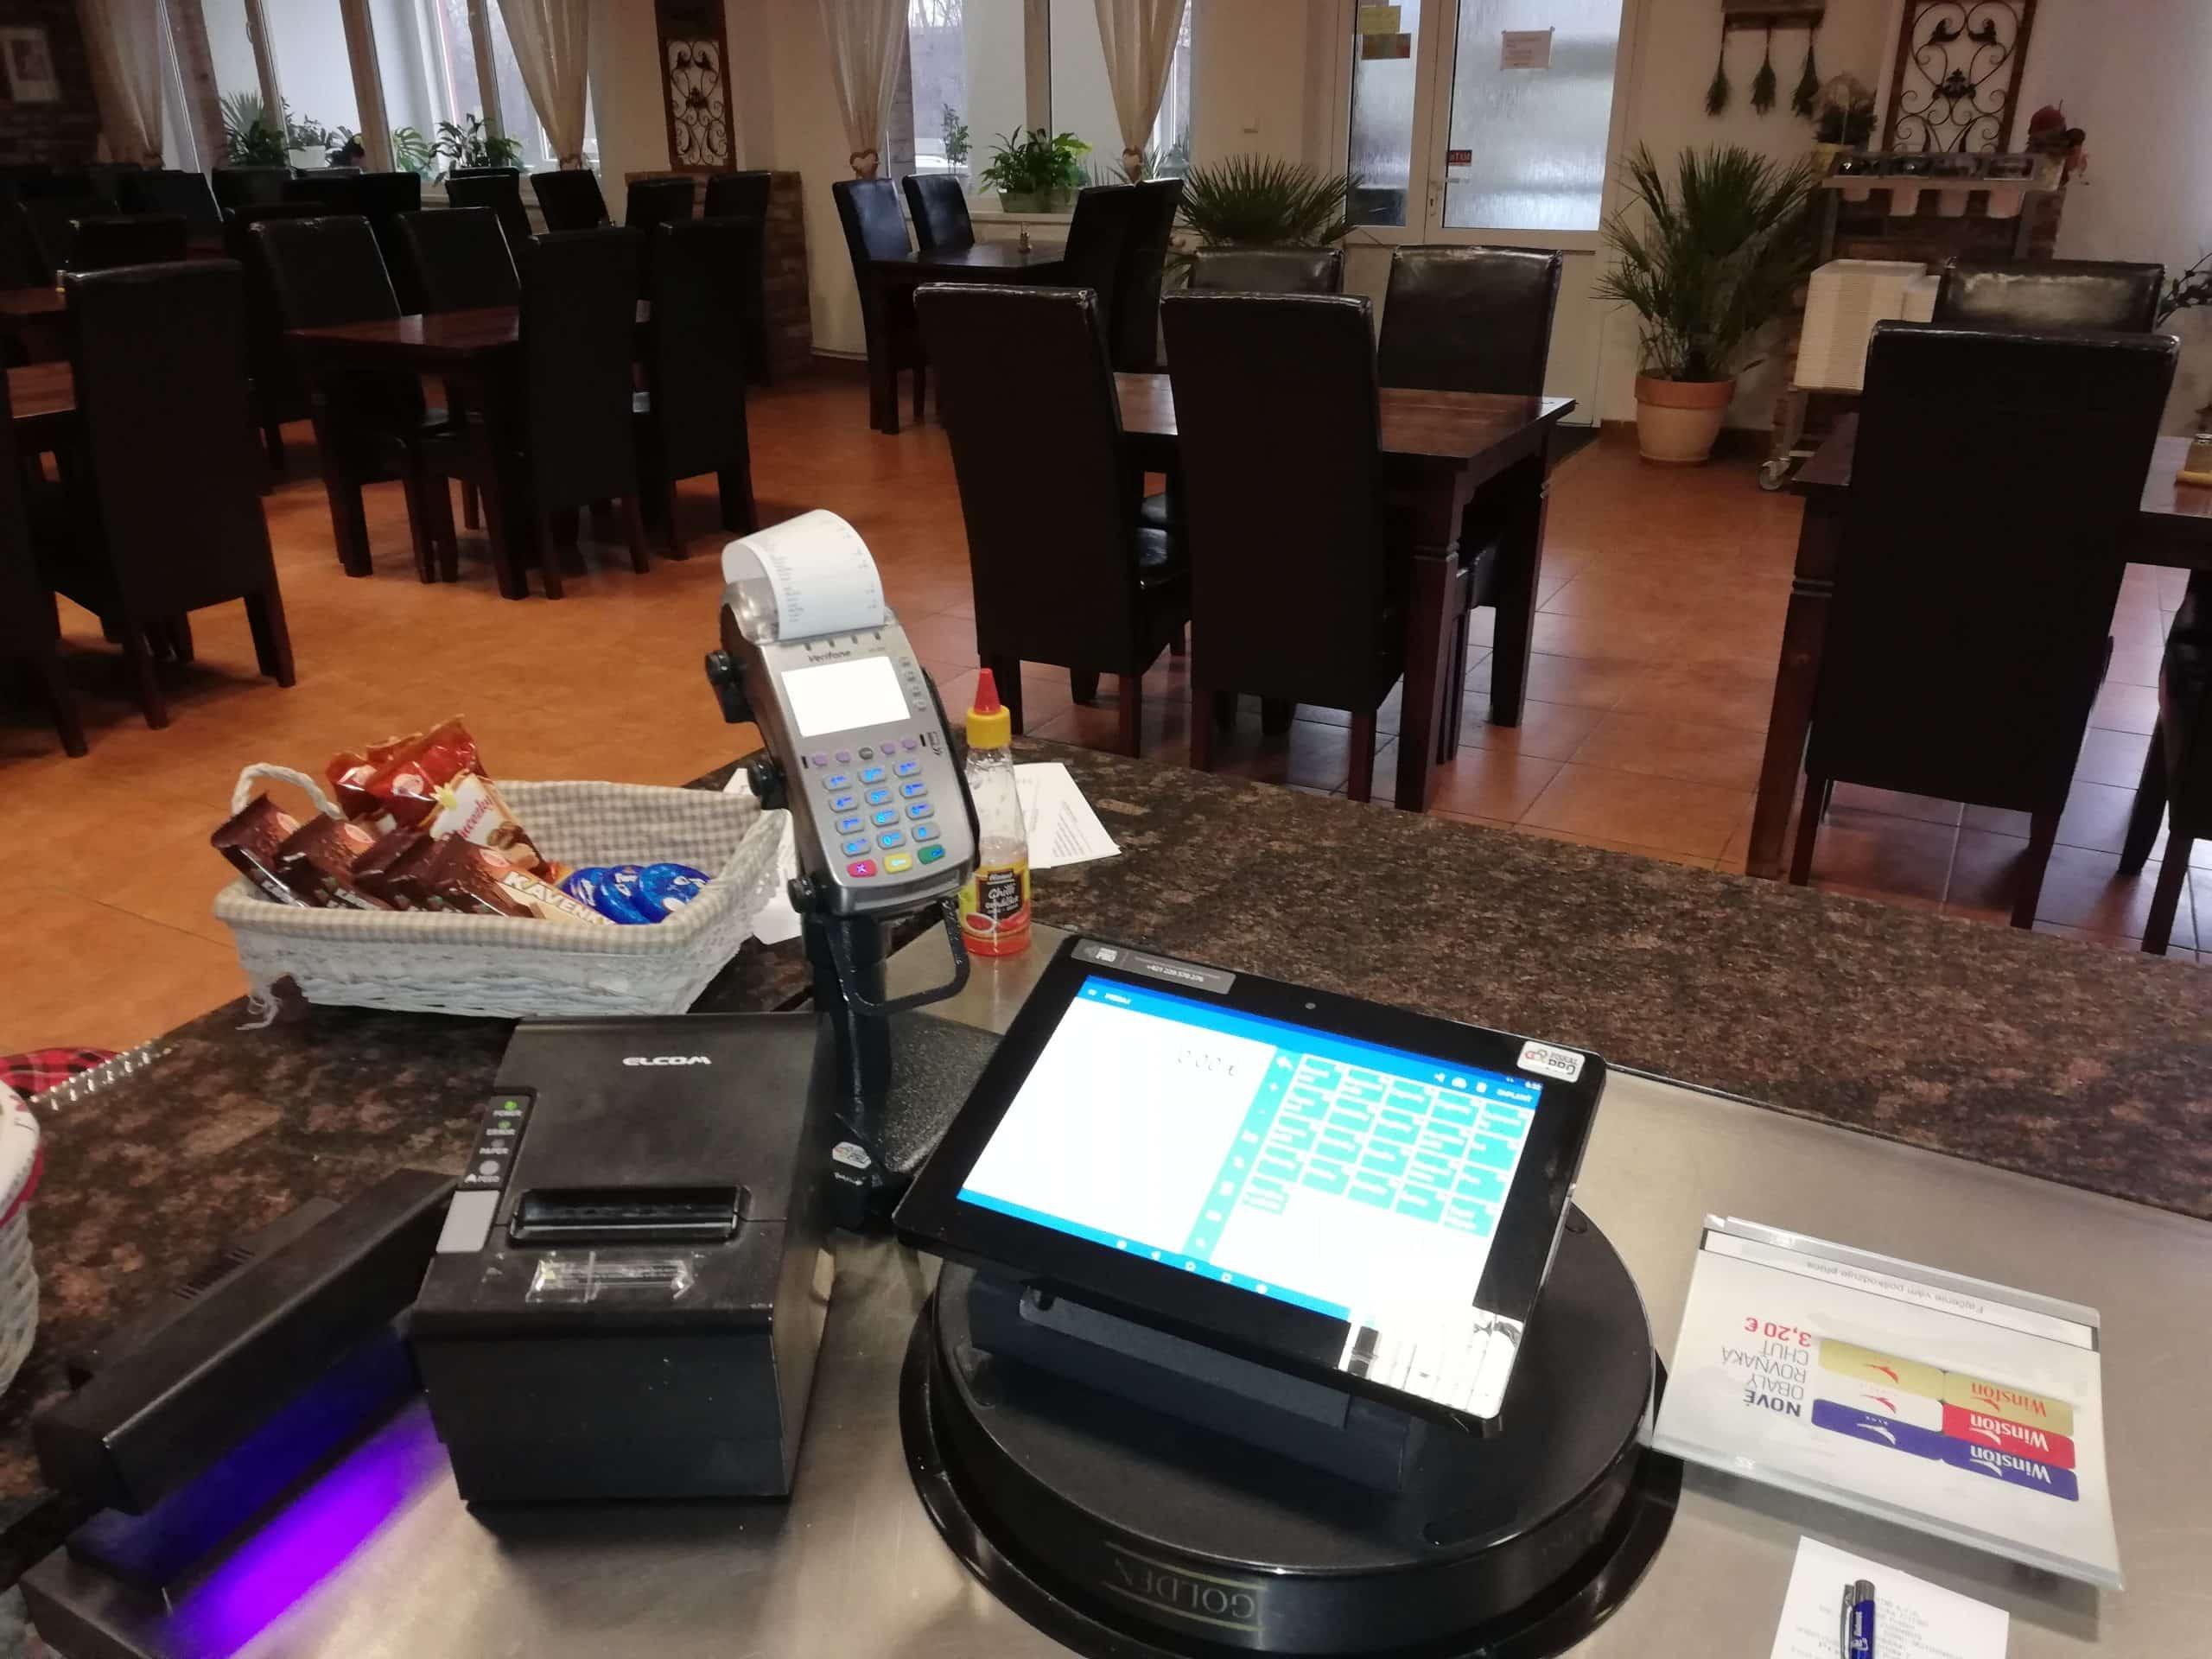 pokladni sestava FiskalPRO v restauraci